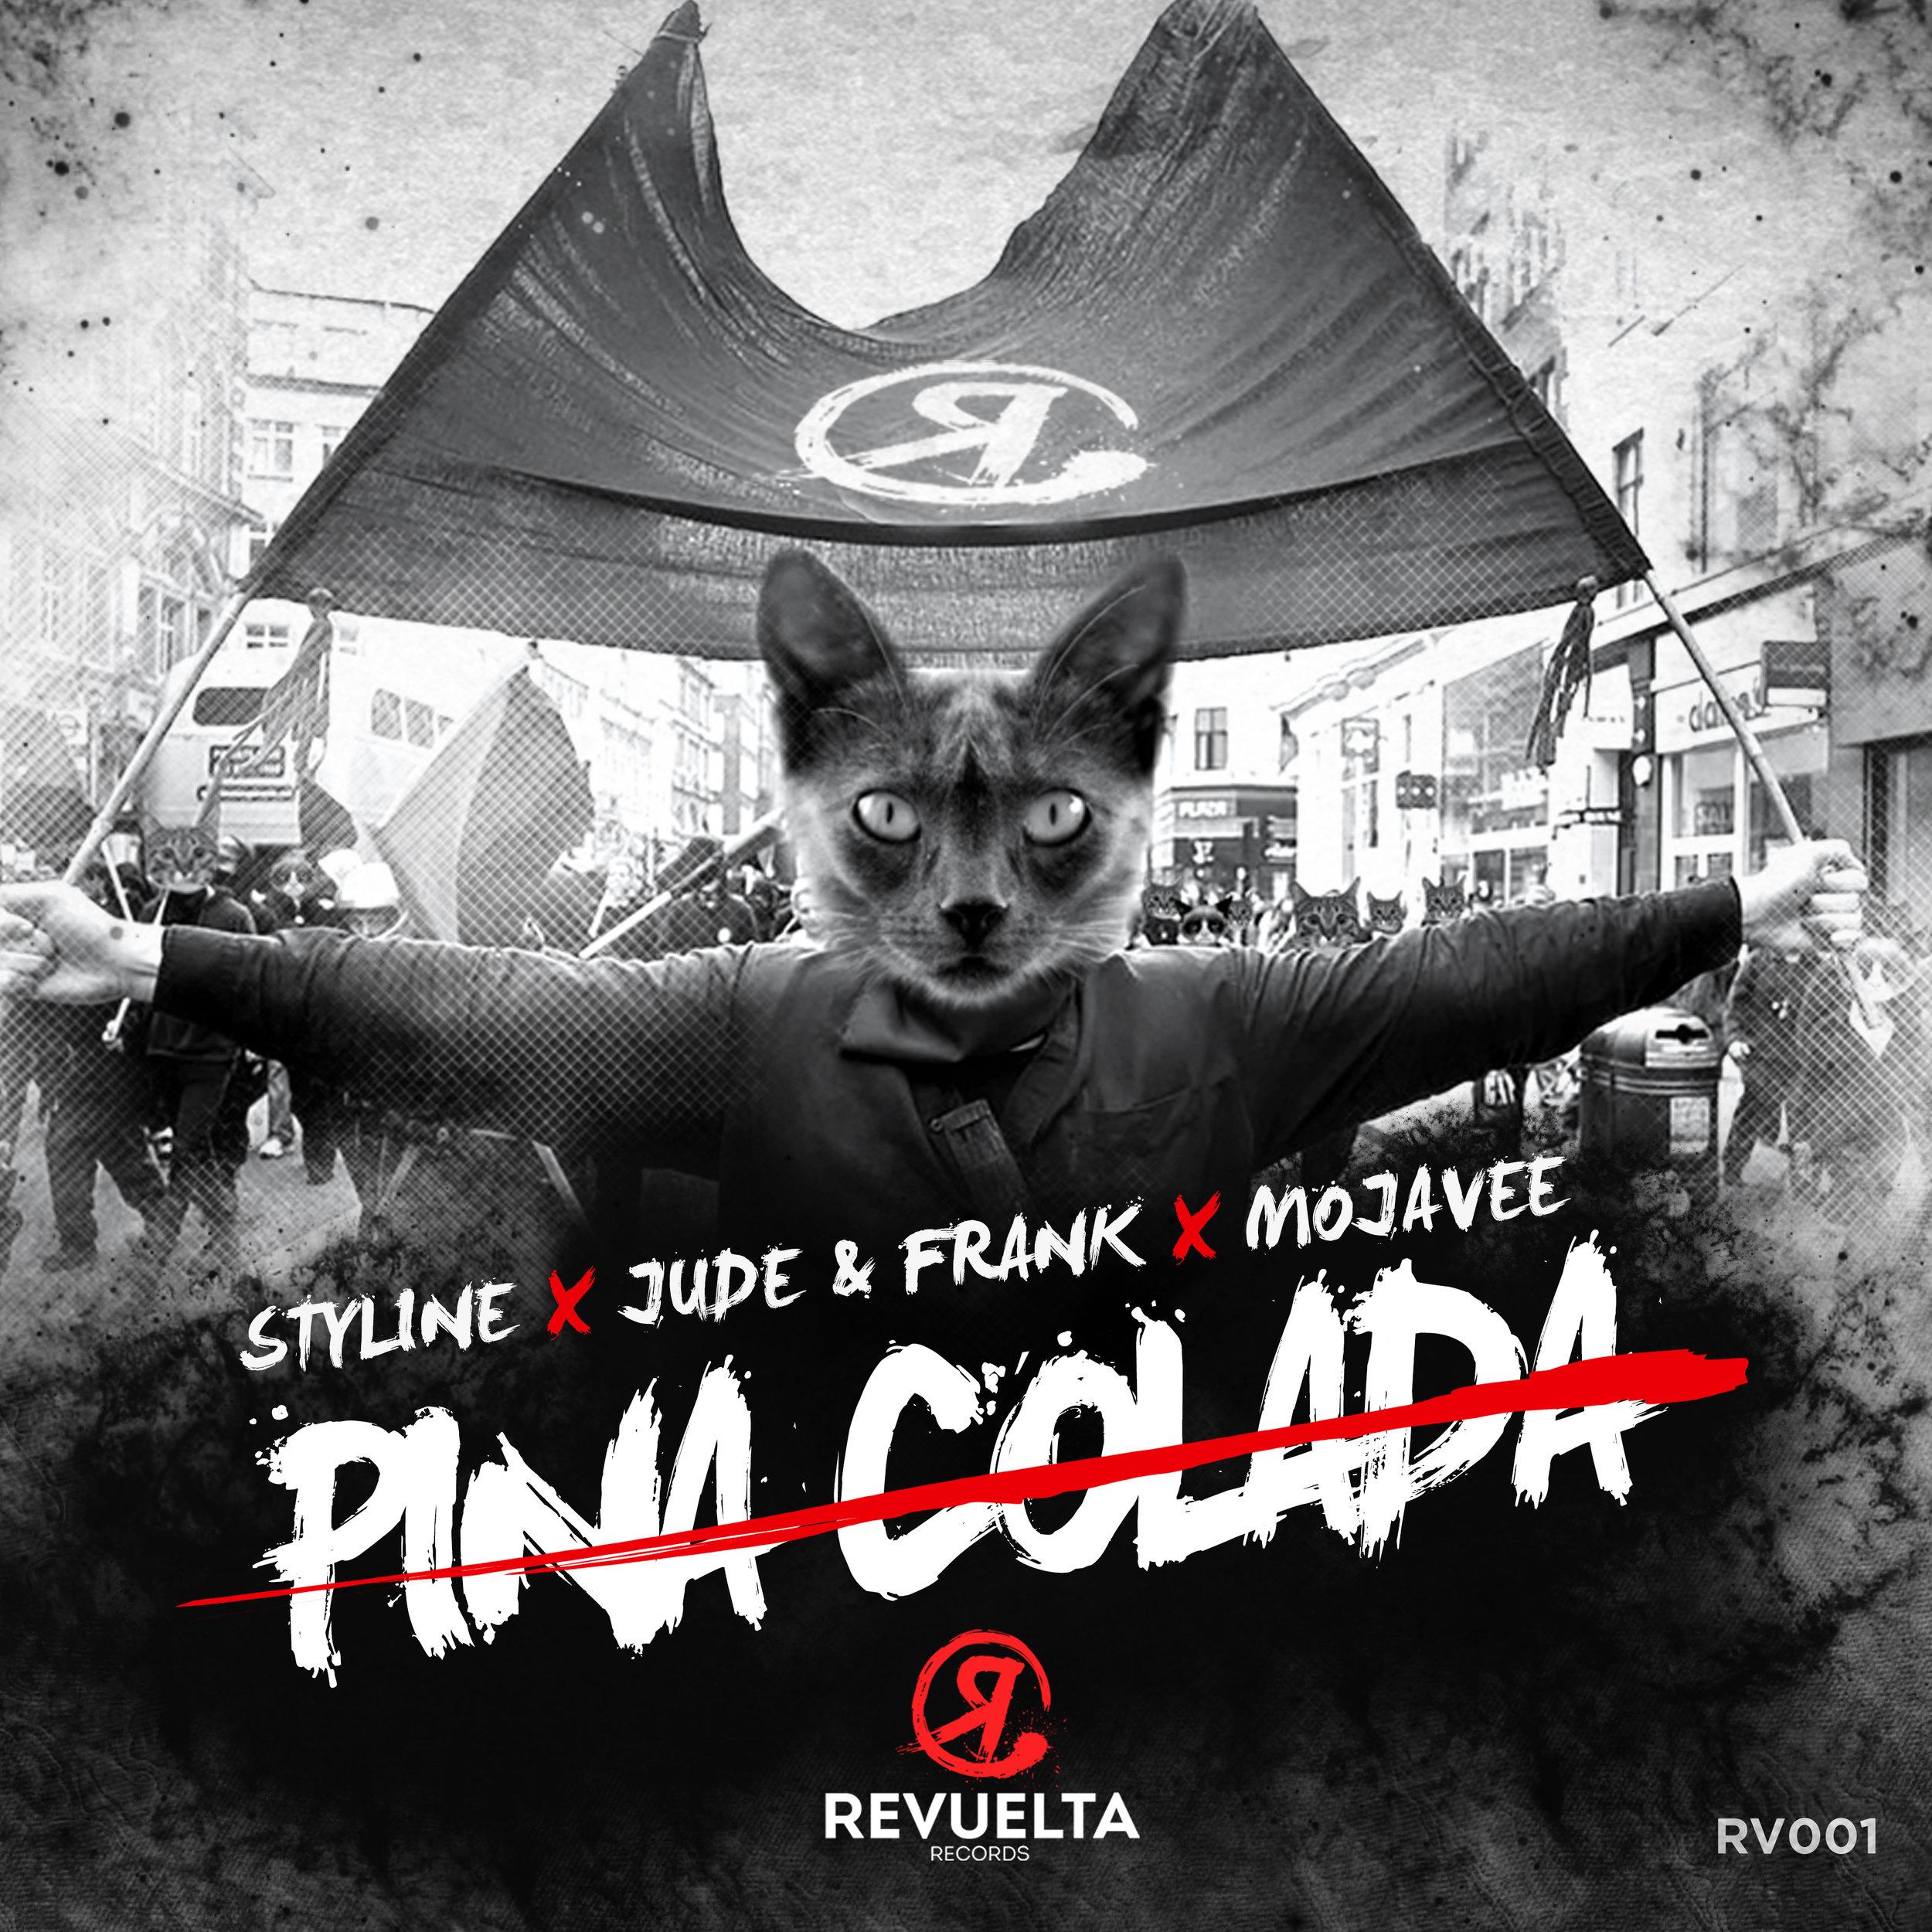 Styline X Jude & Frank X Mojavee - Pina Colada